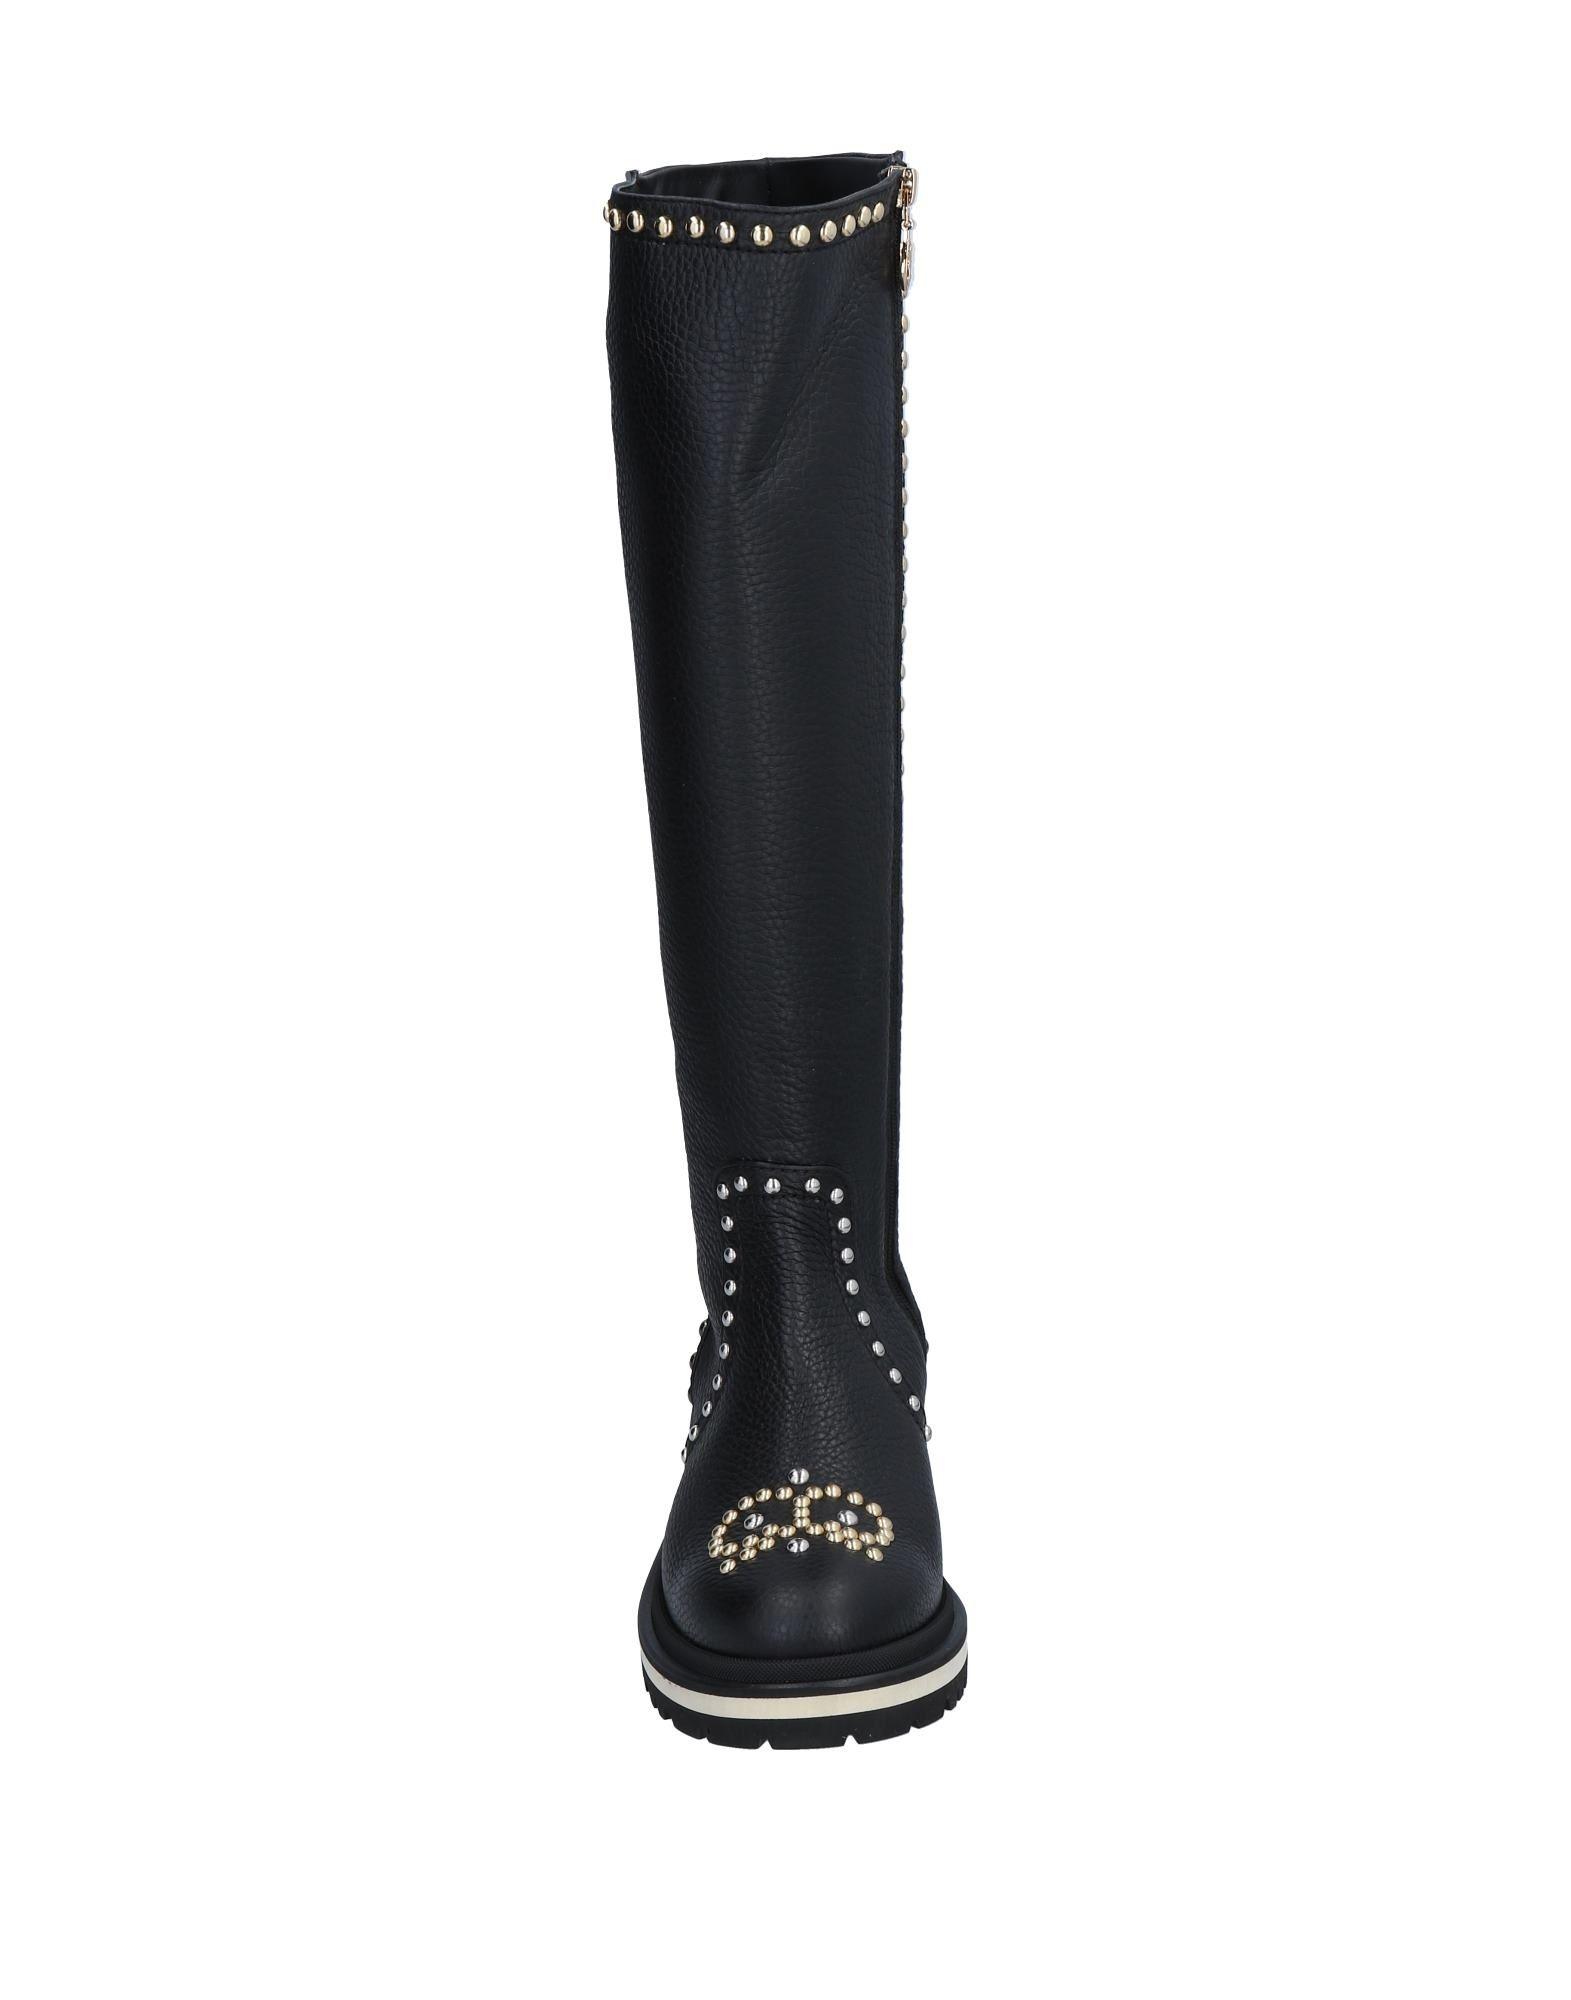 Rabatt Schuhe Fabi Damen Stiefel Damen Fabi  11535957PV 5de1a5